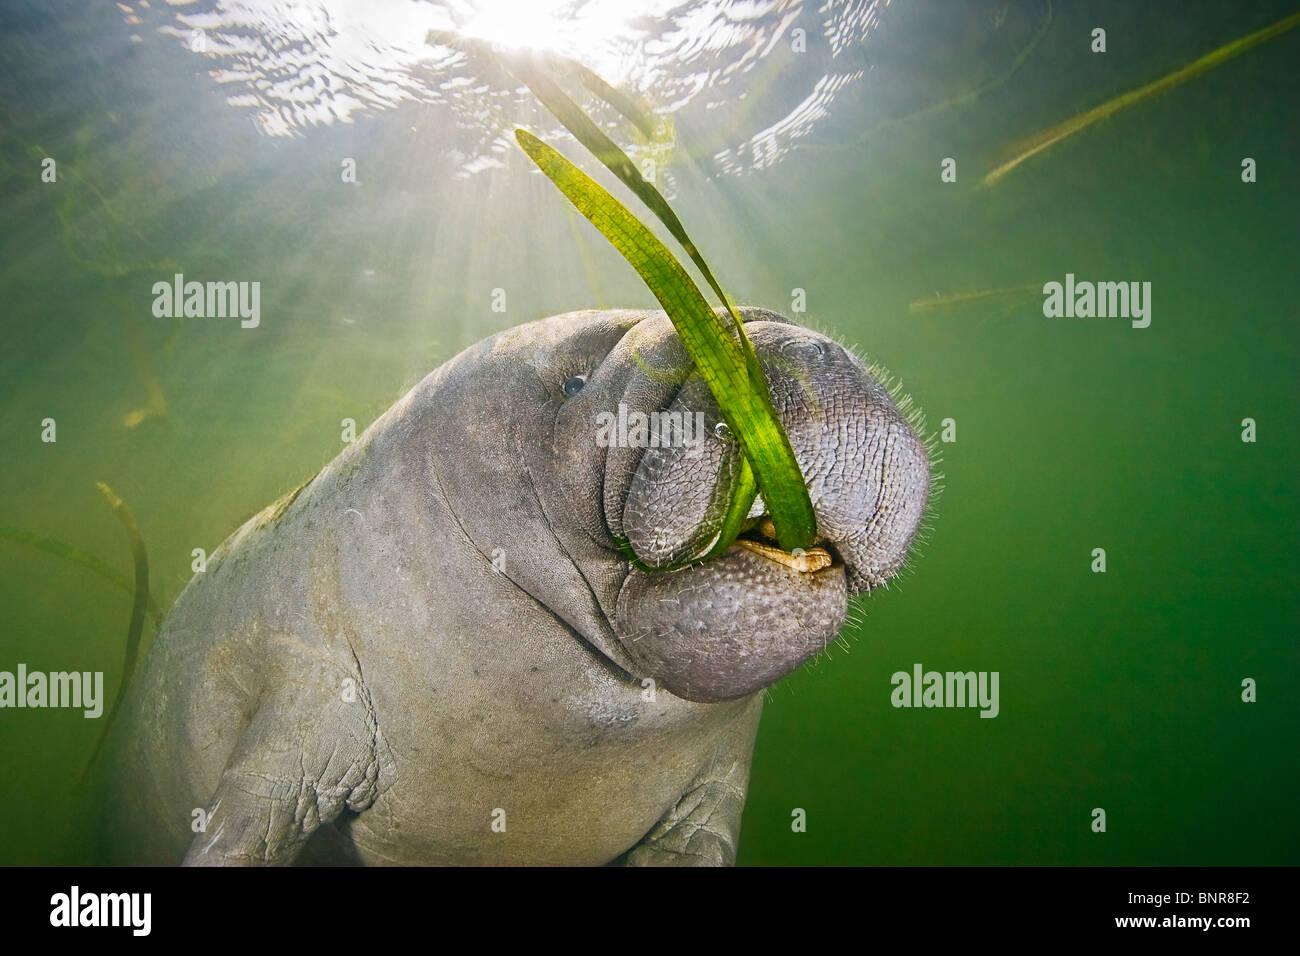 Florida-Manati, Trichechus Manatus Latirostris, Kälberfütterung auf Seegras. Stockbild